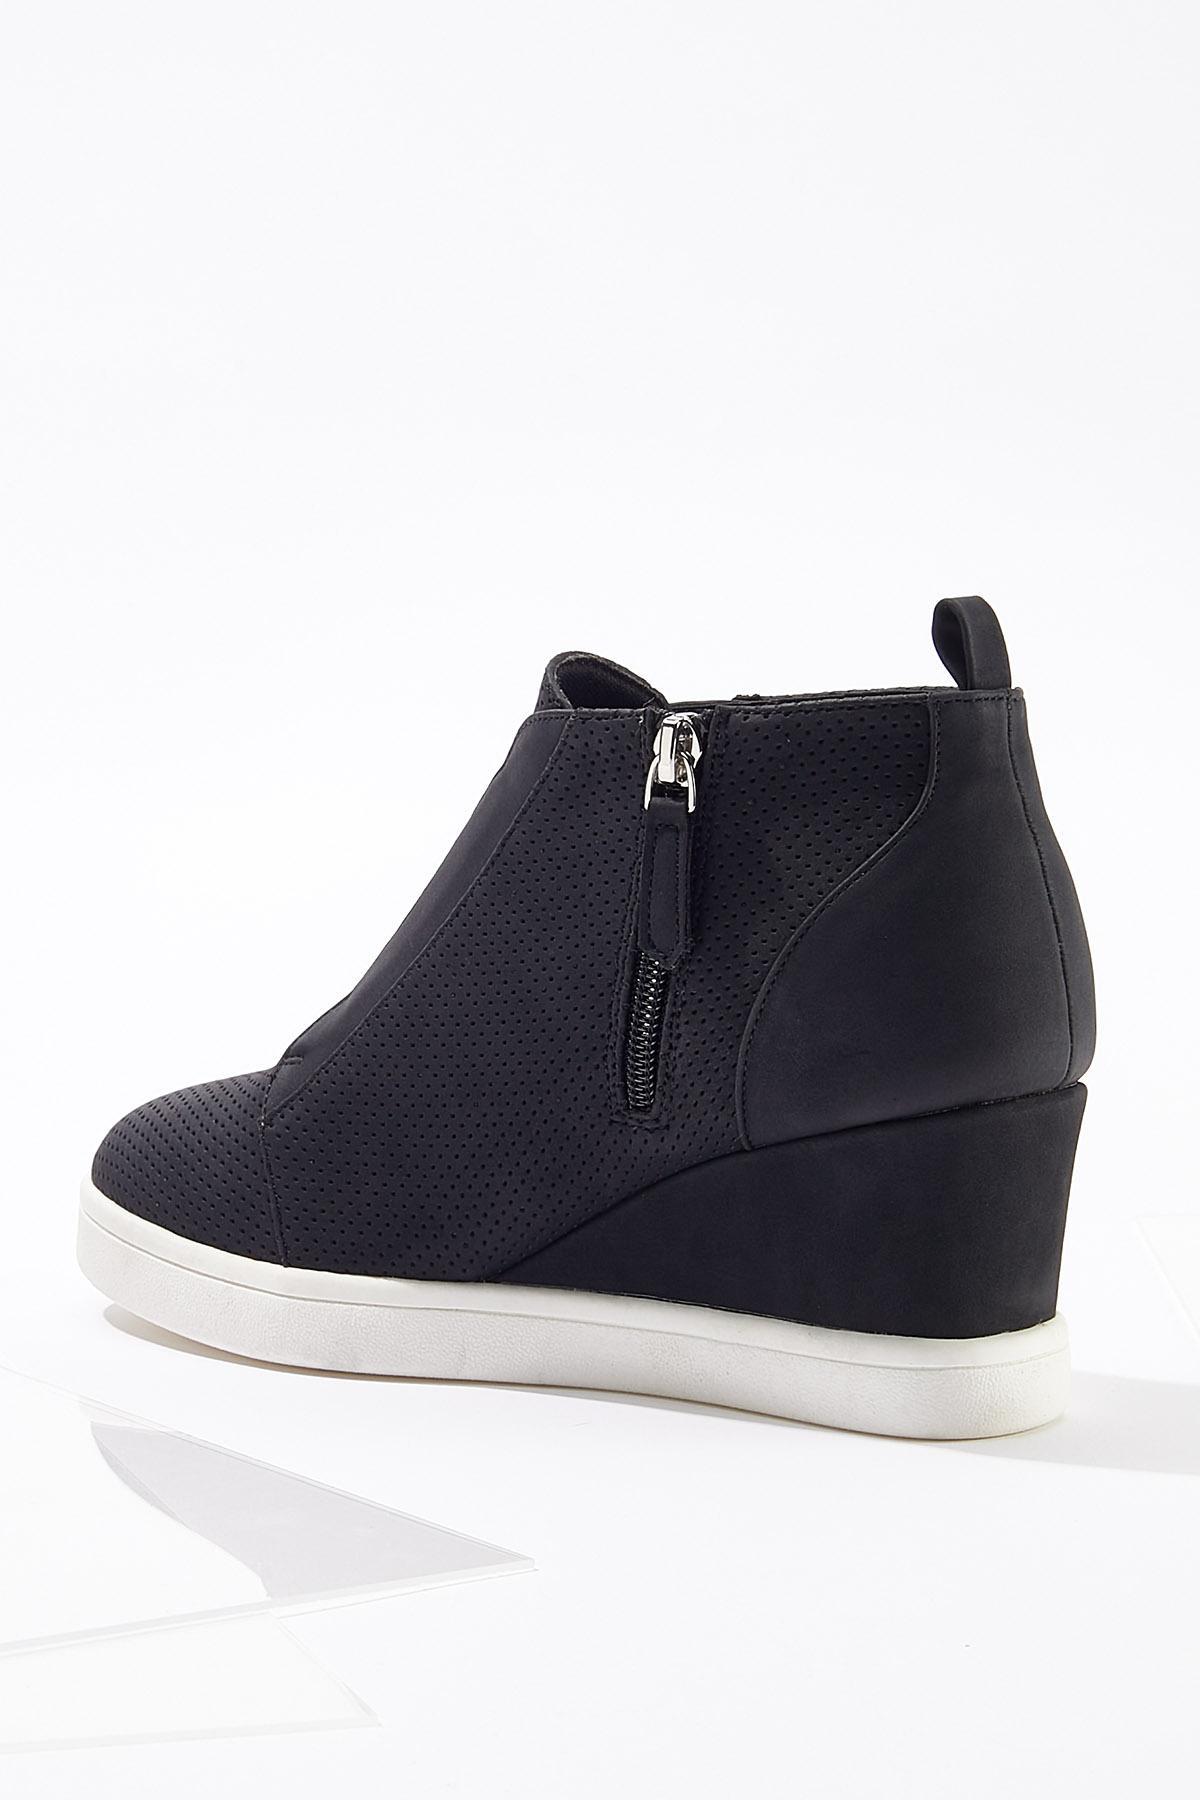 Perforated Wedge Sneakers (Item #44715404)